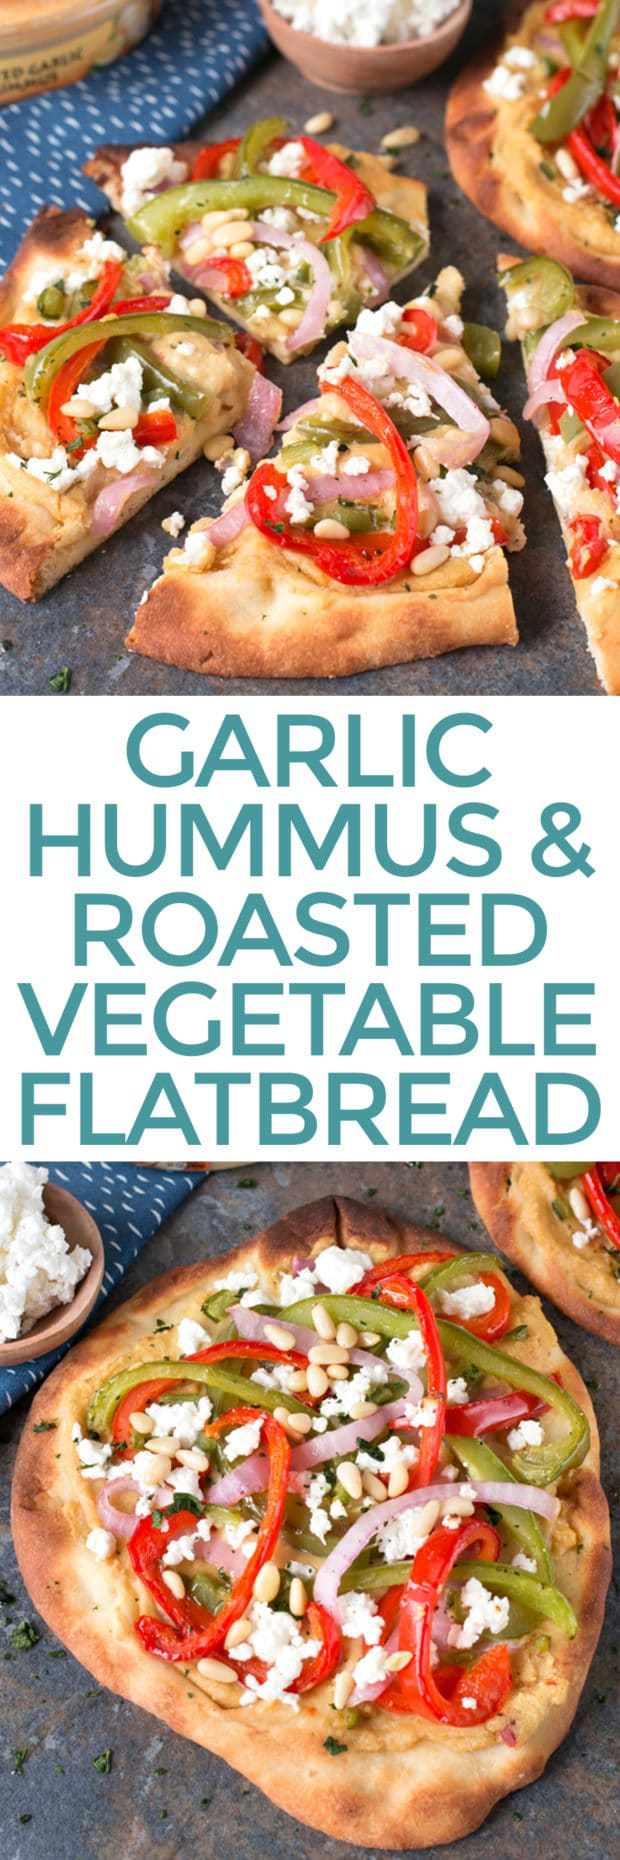 Garlic Hummus & Roasted Vegetable Grilled Flatbread | cakenknife.com #unofficialmeal #appetizer #grilling